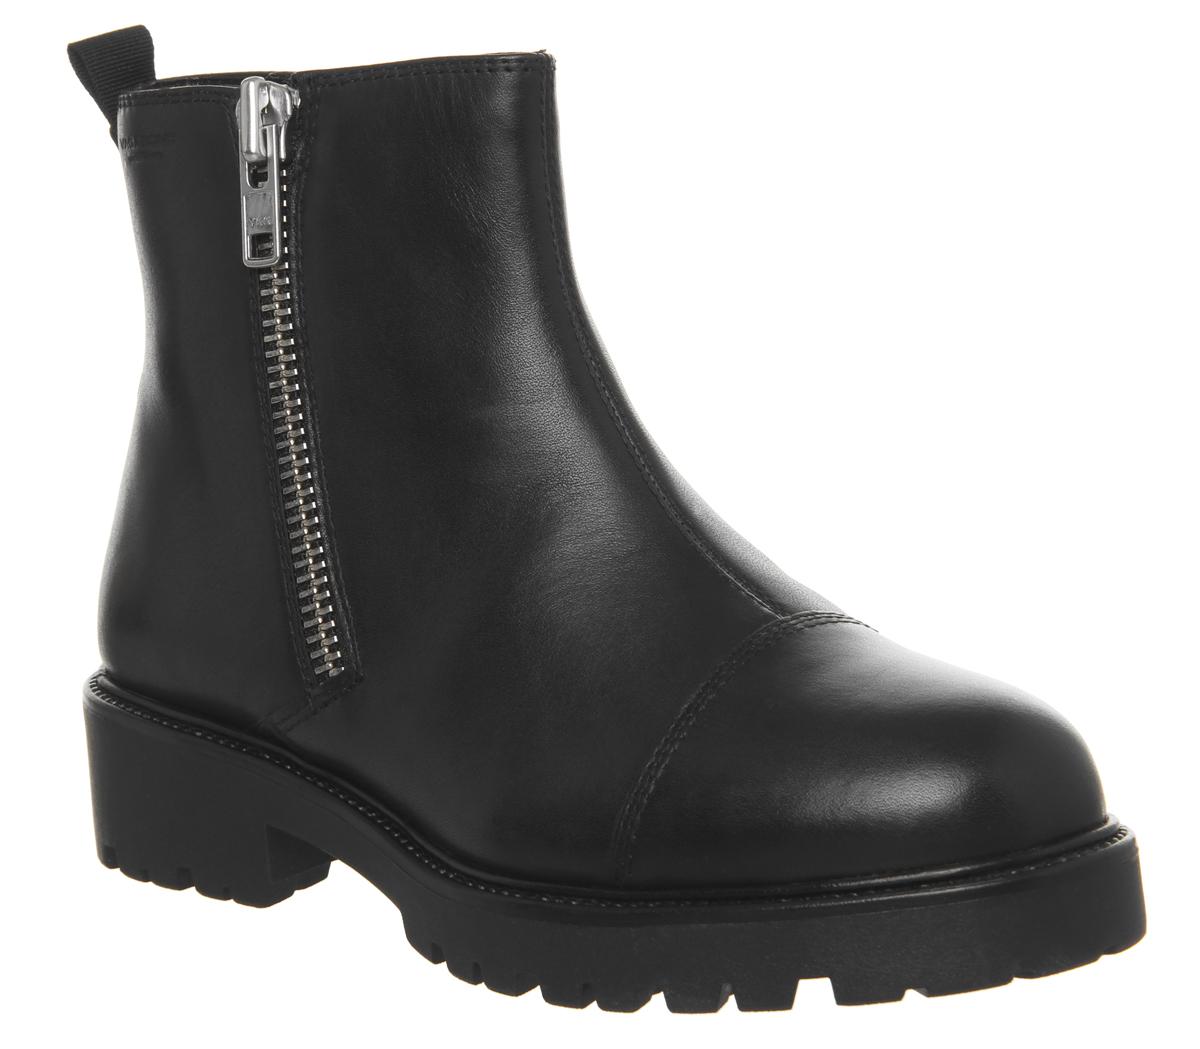 Botas Lateral para mujer Vagabond Kenova Cremallera Lateral Botas Botas De Cuero Negro c609f7